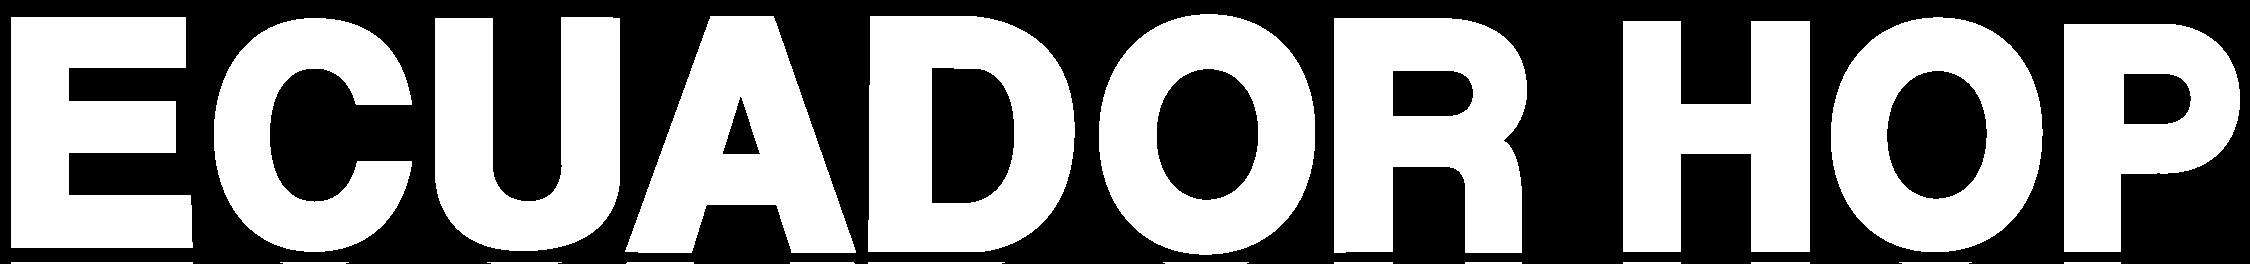 EcuadorHop